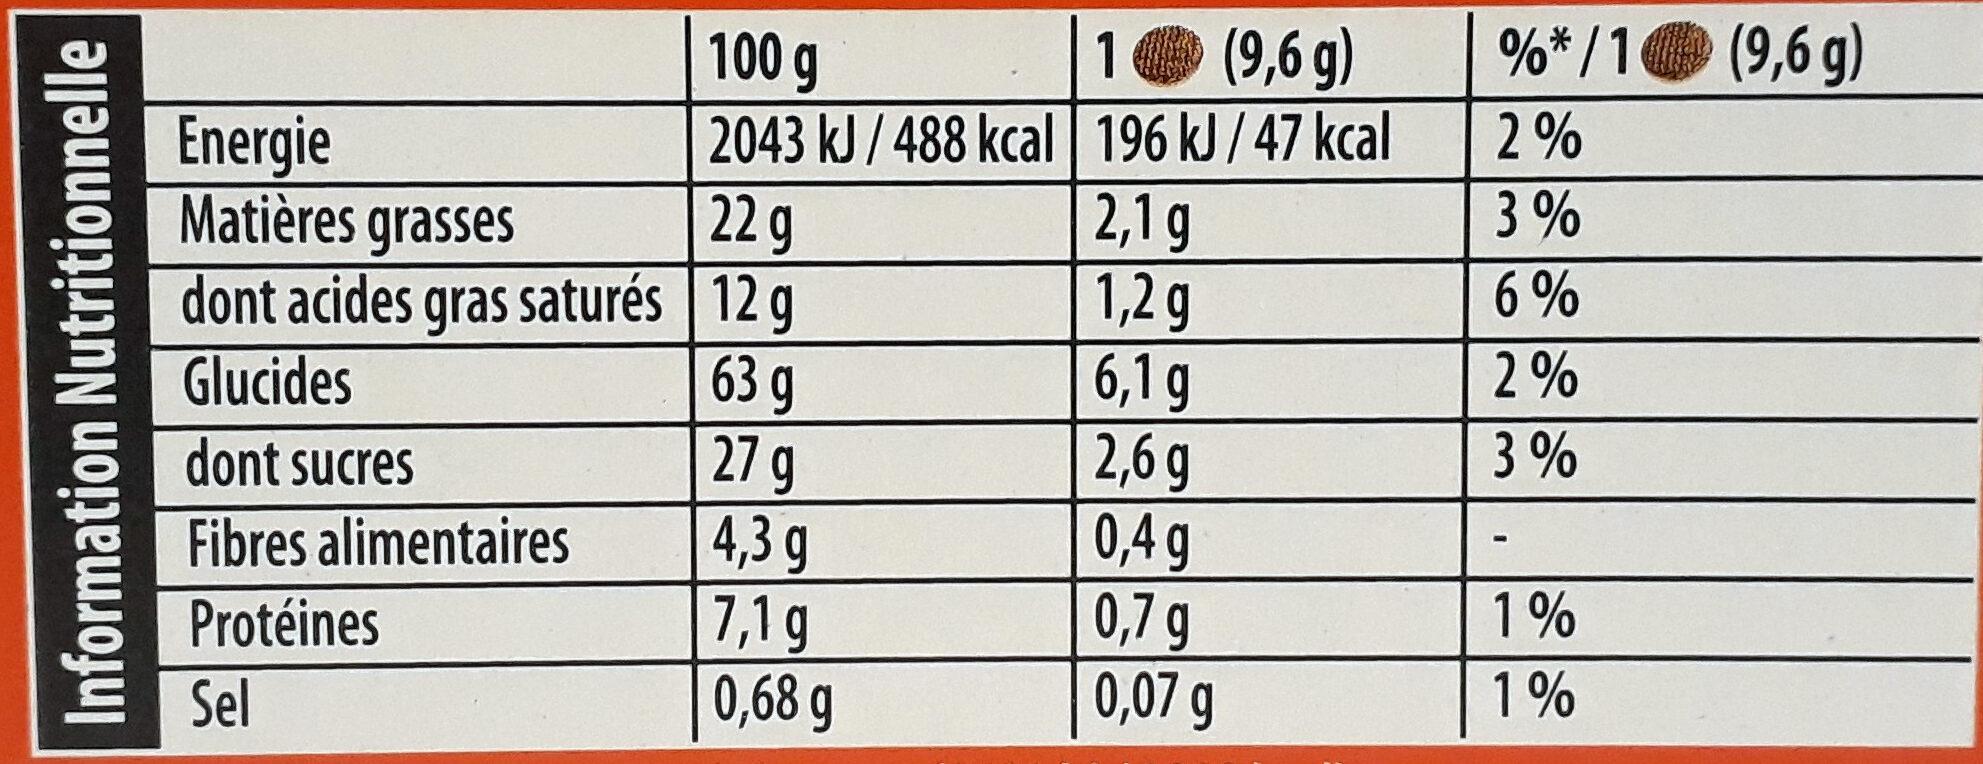 Pépito - Chocolat noir - Informazioni nutrizionali - fr